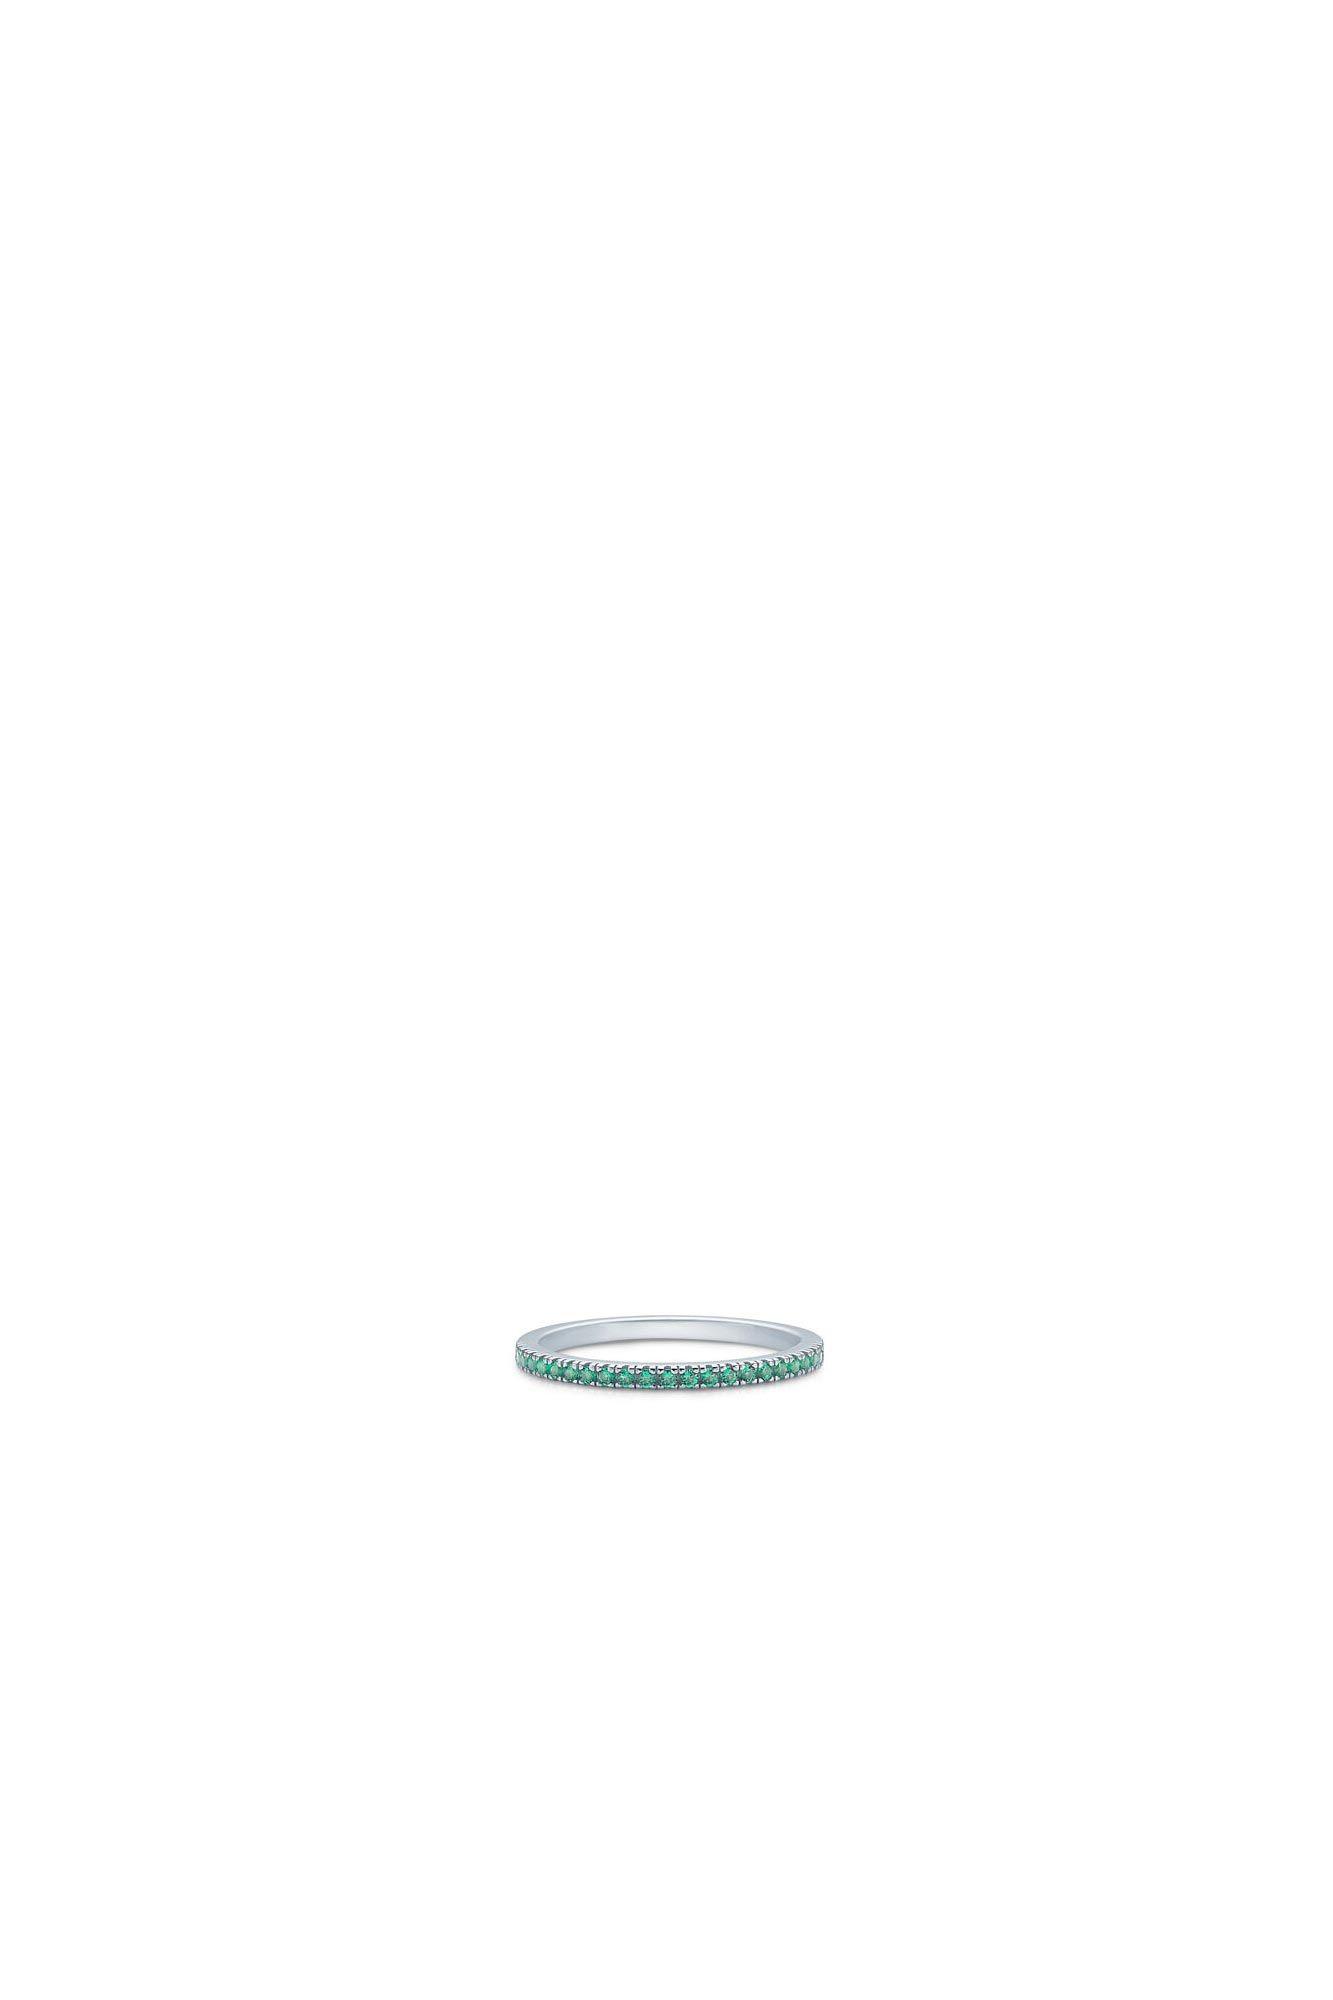 Simplicity IDR012RH, RHODIUM/GREEN